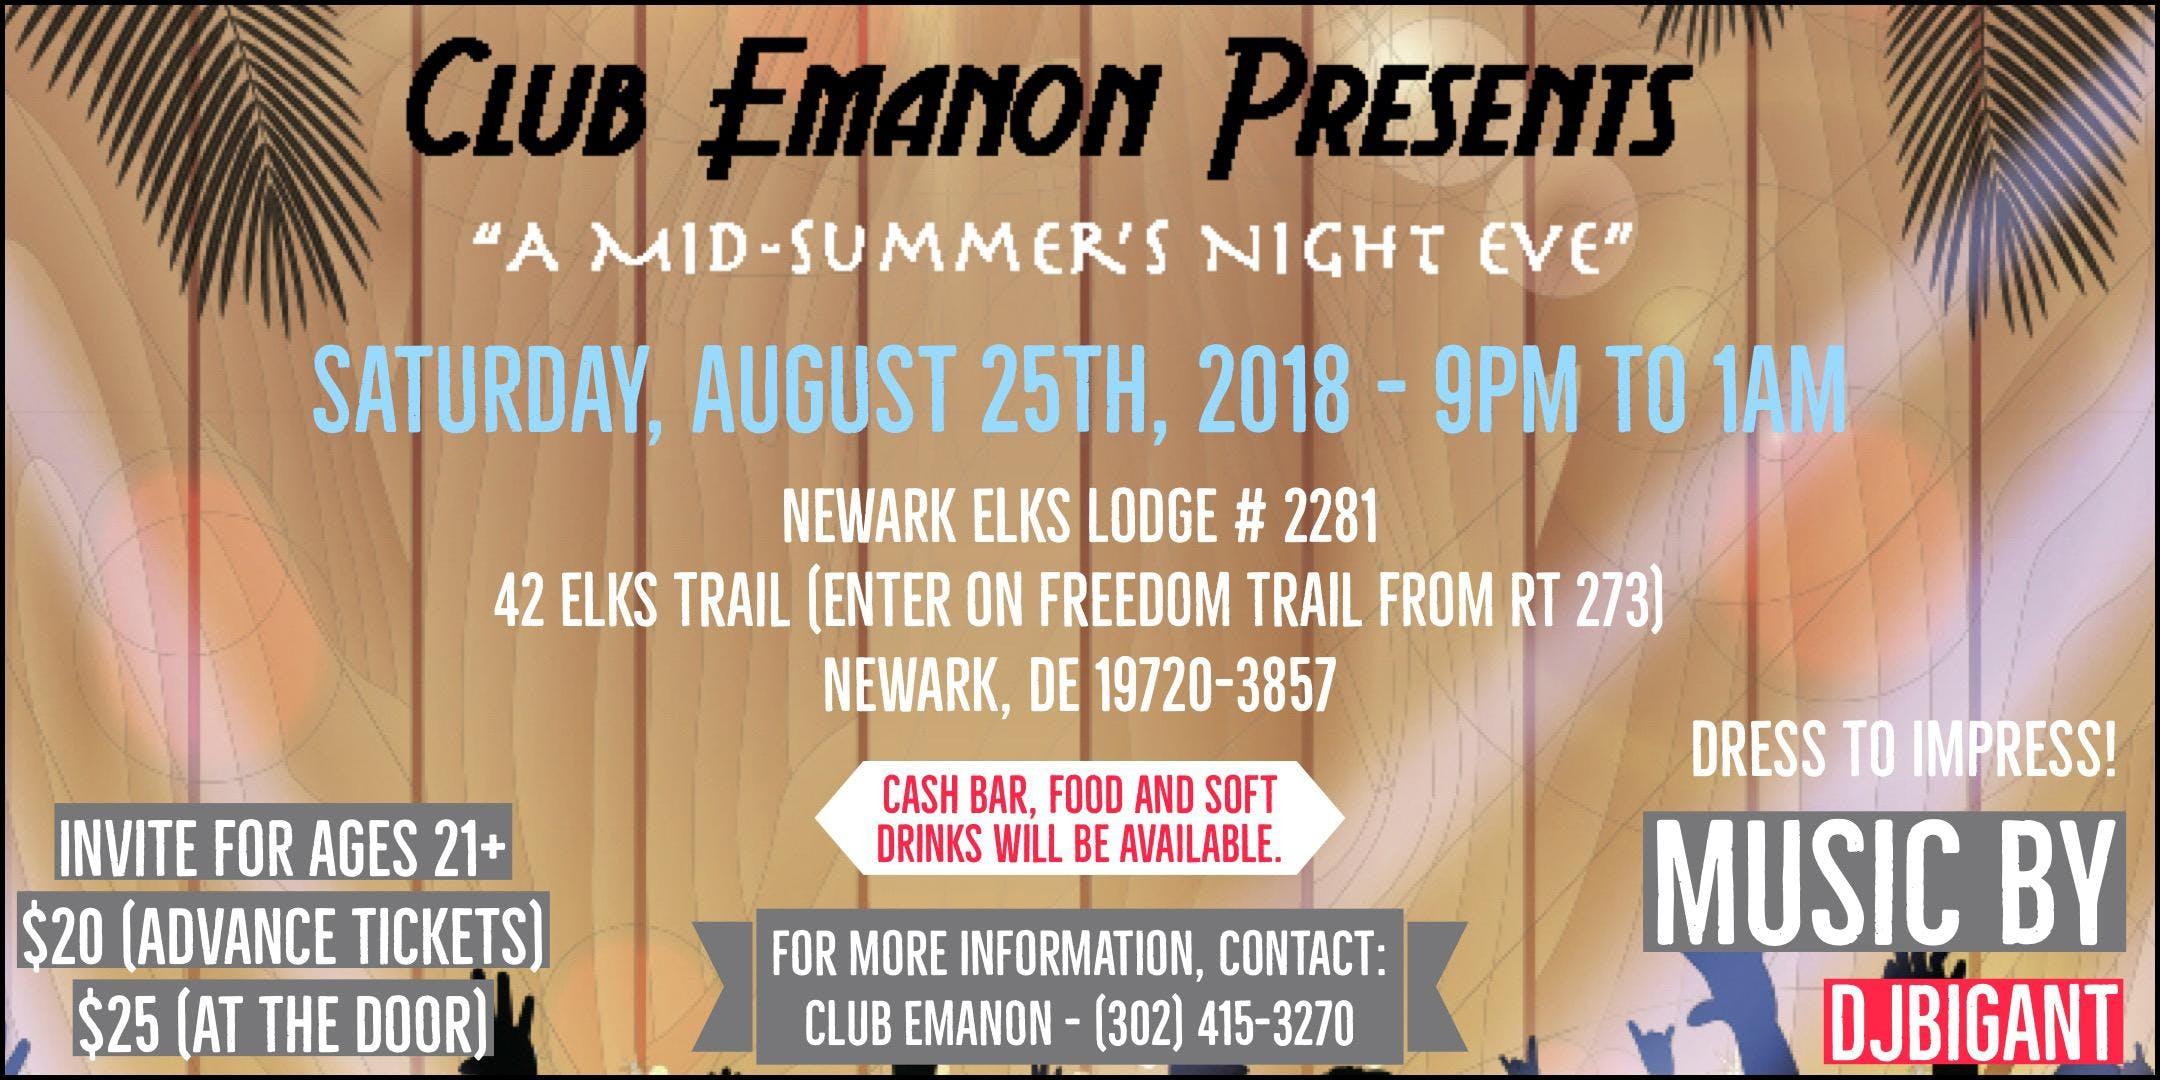 Mid-Summers Night Eve